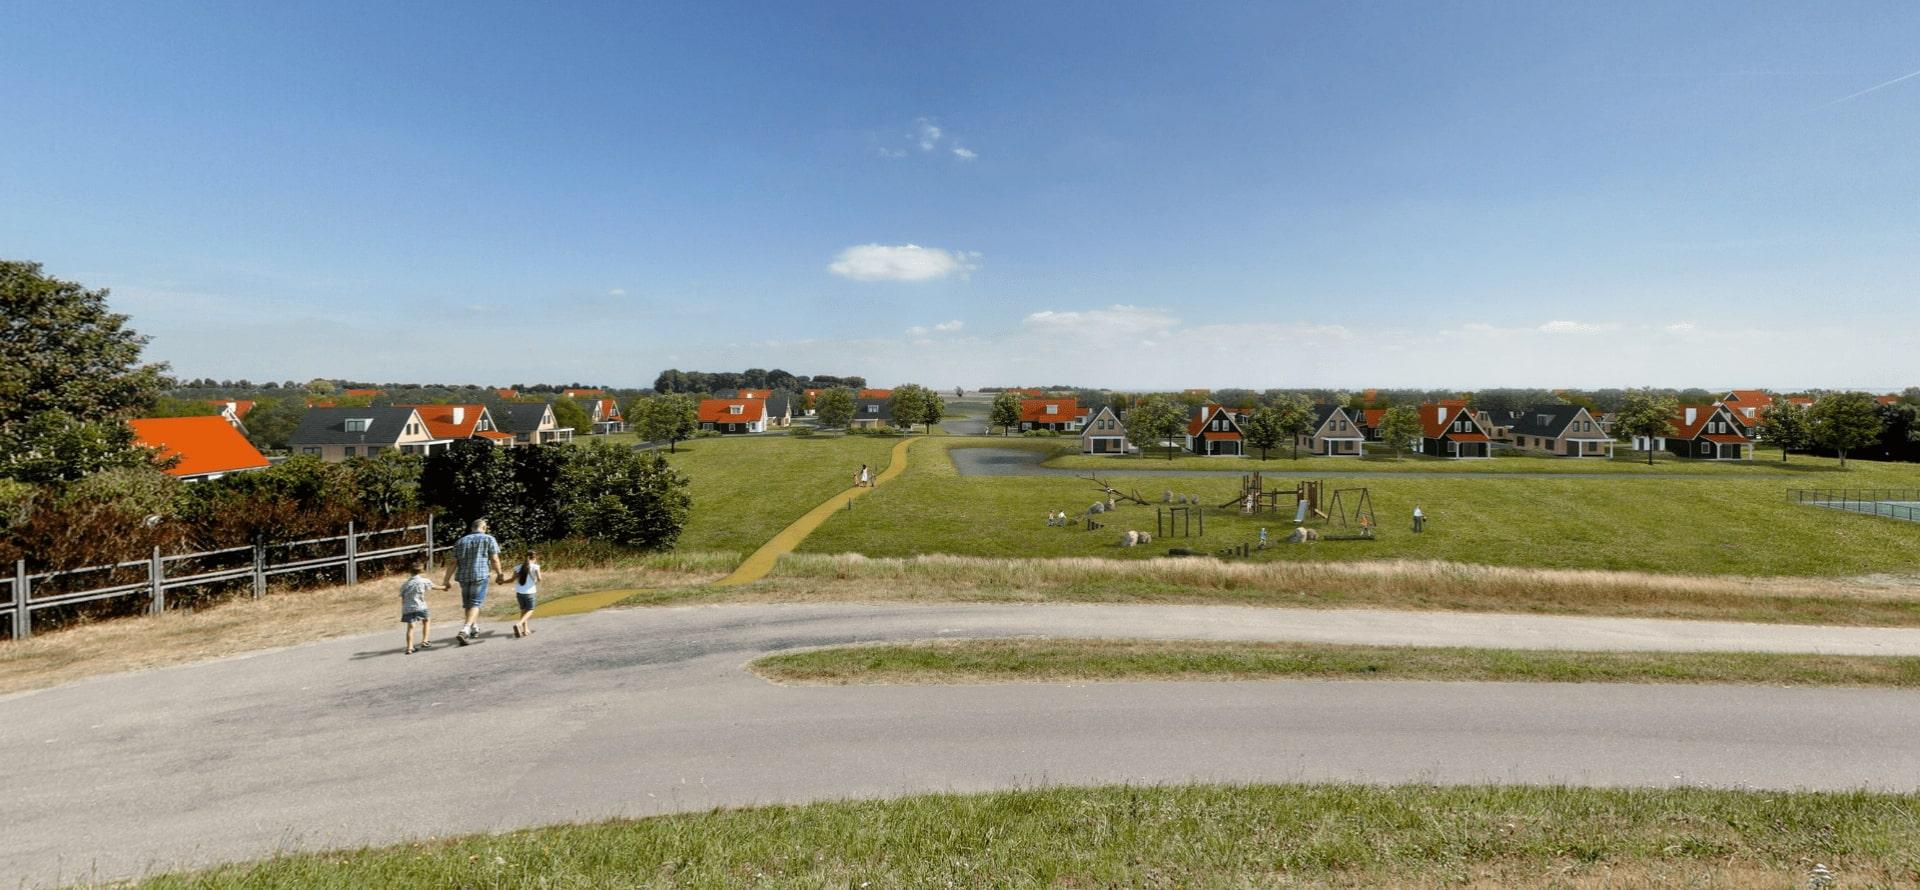 Vakantiepark Wulpdal